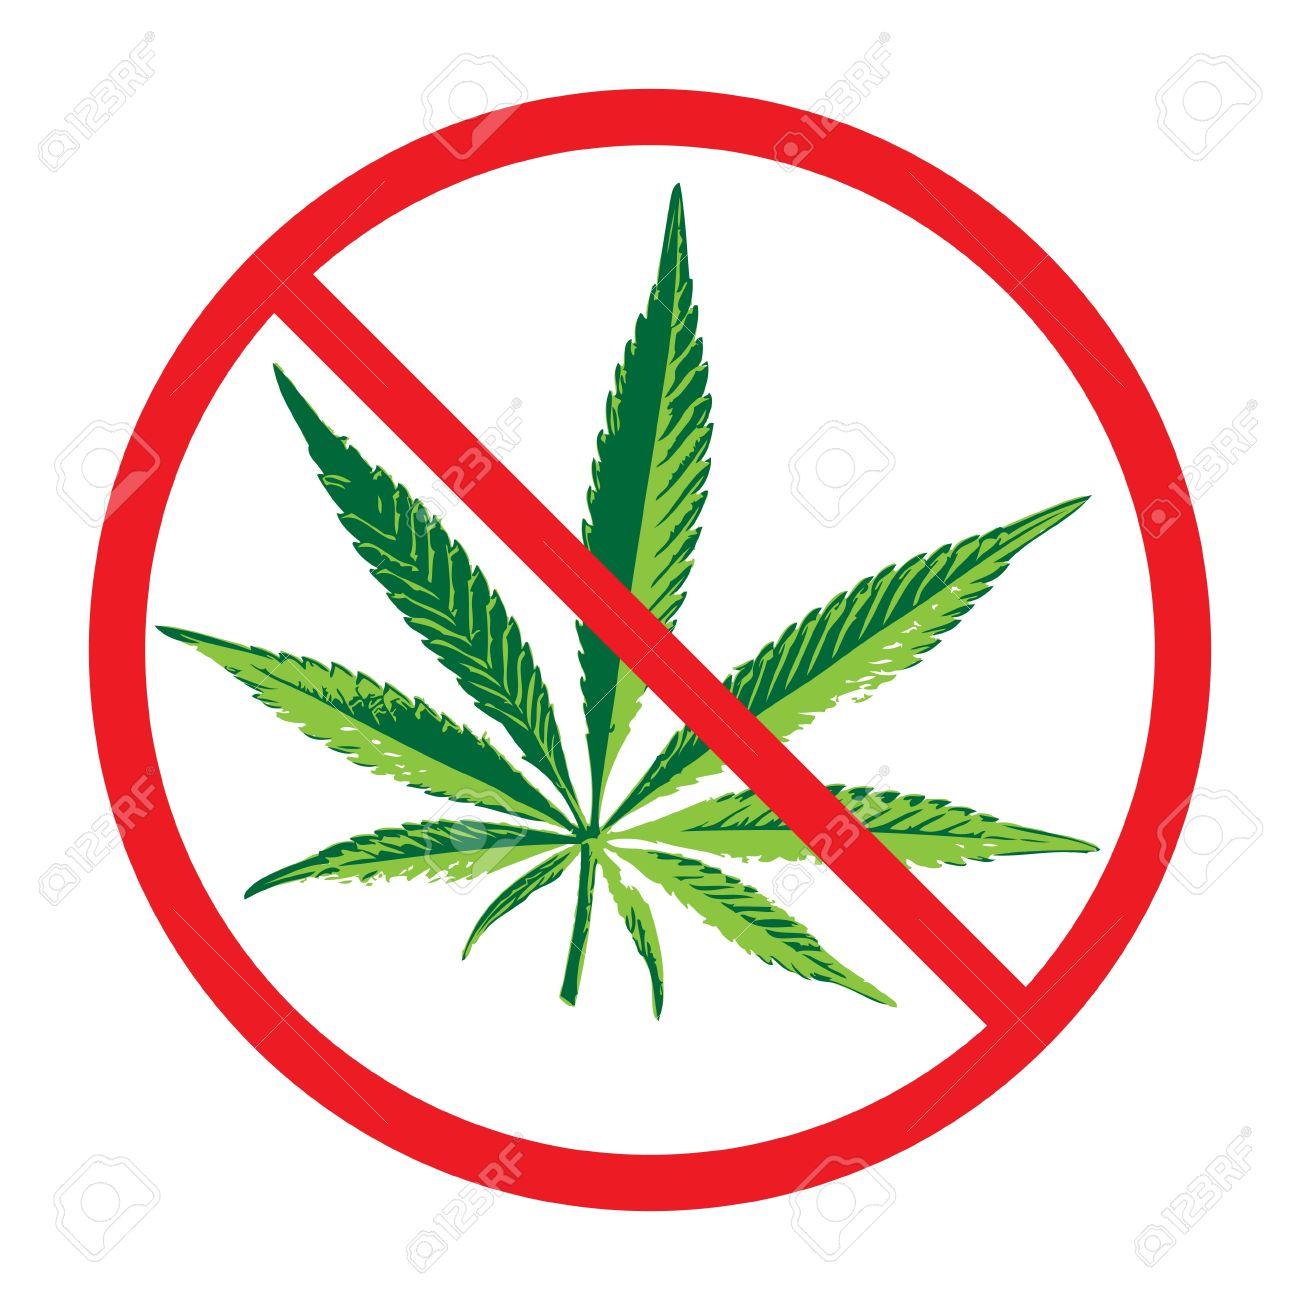 Cannabis Ban Sign, Vector Illustration Royalty Free Cliparts.